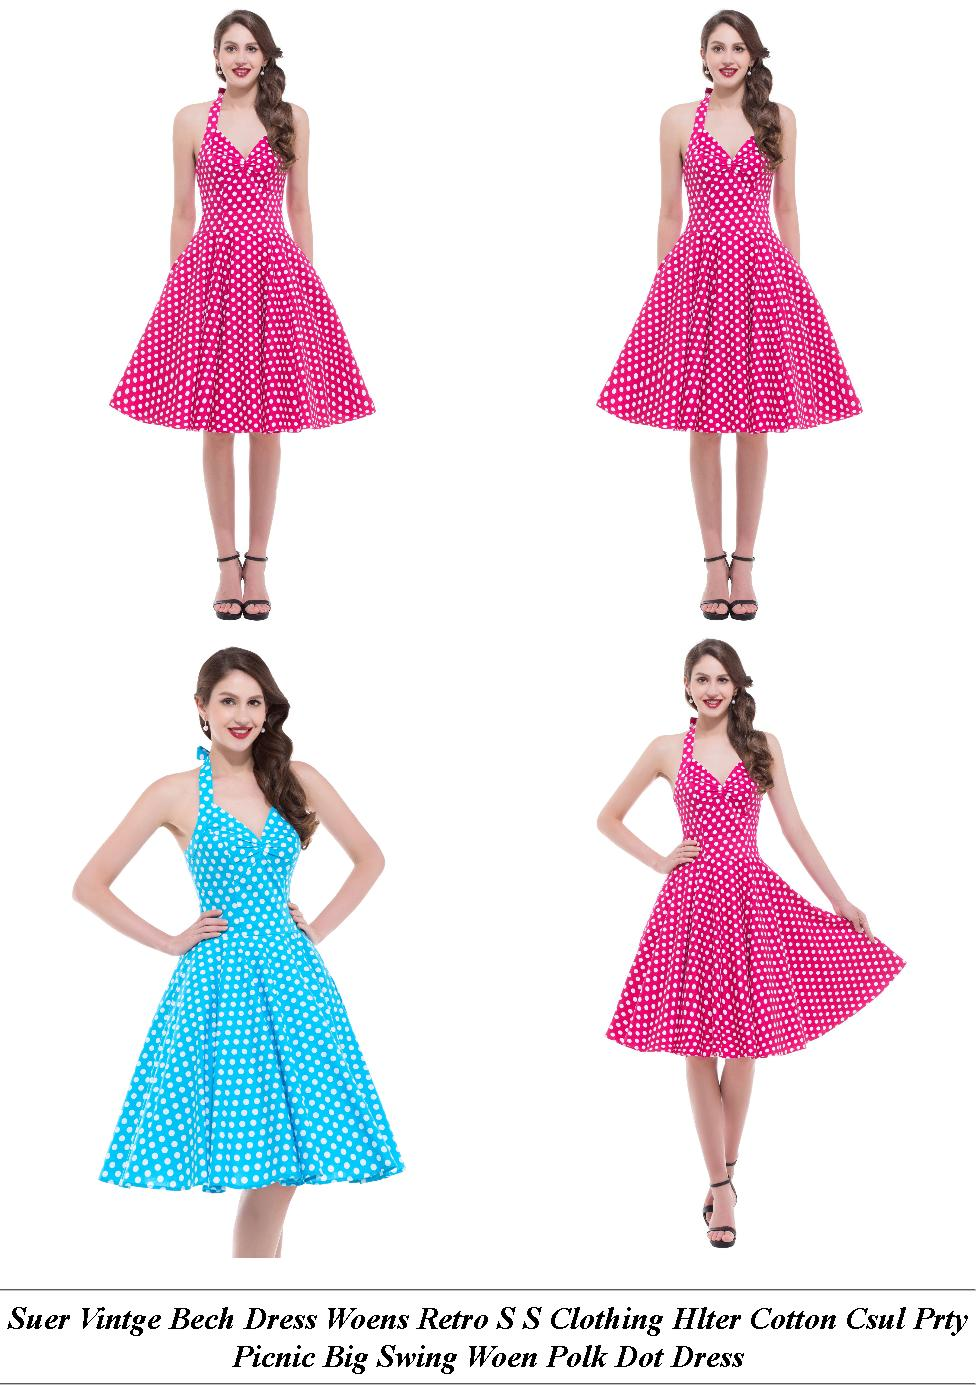 Summer Dresses - Dresses For Sale Online - Ross Dress For Less - Cheap Clothes Shops